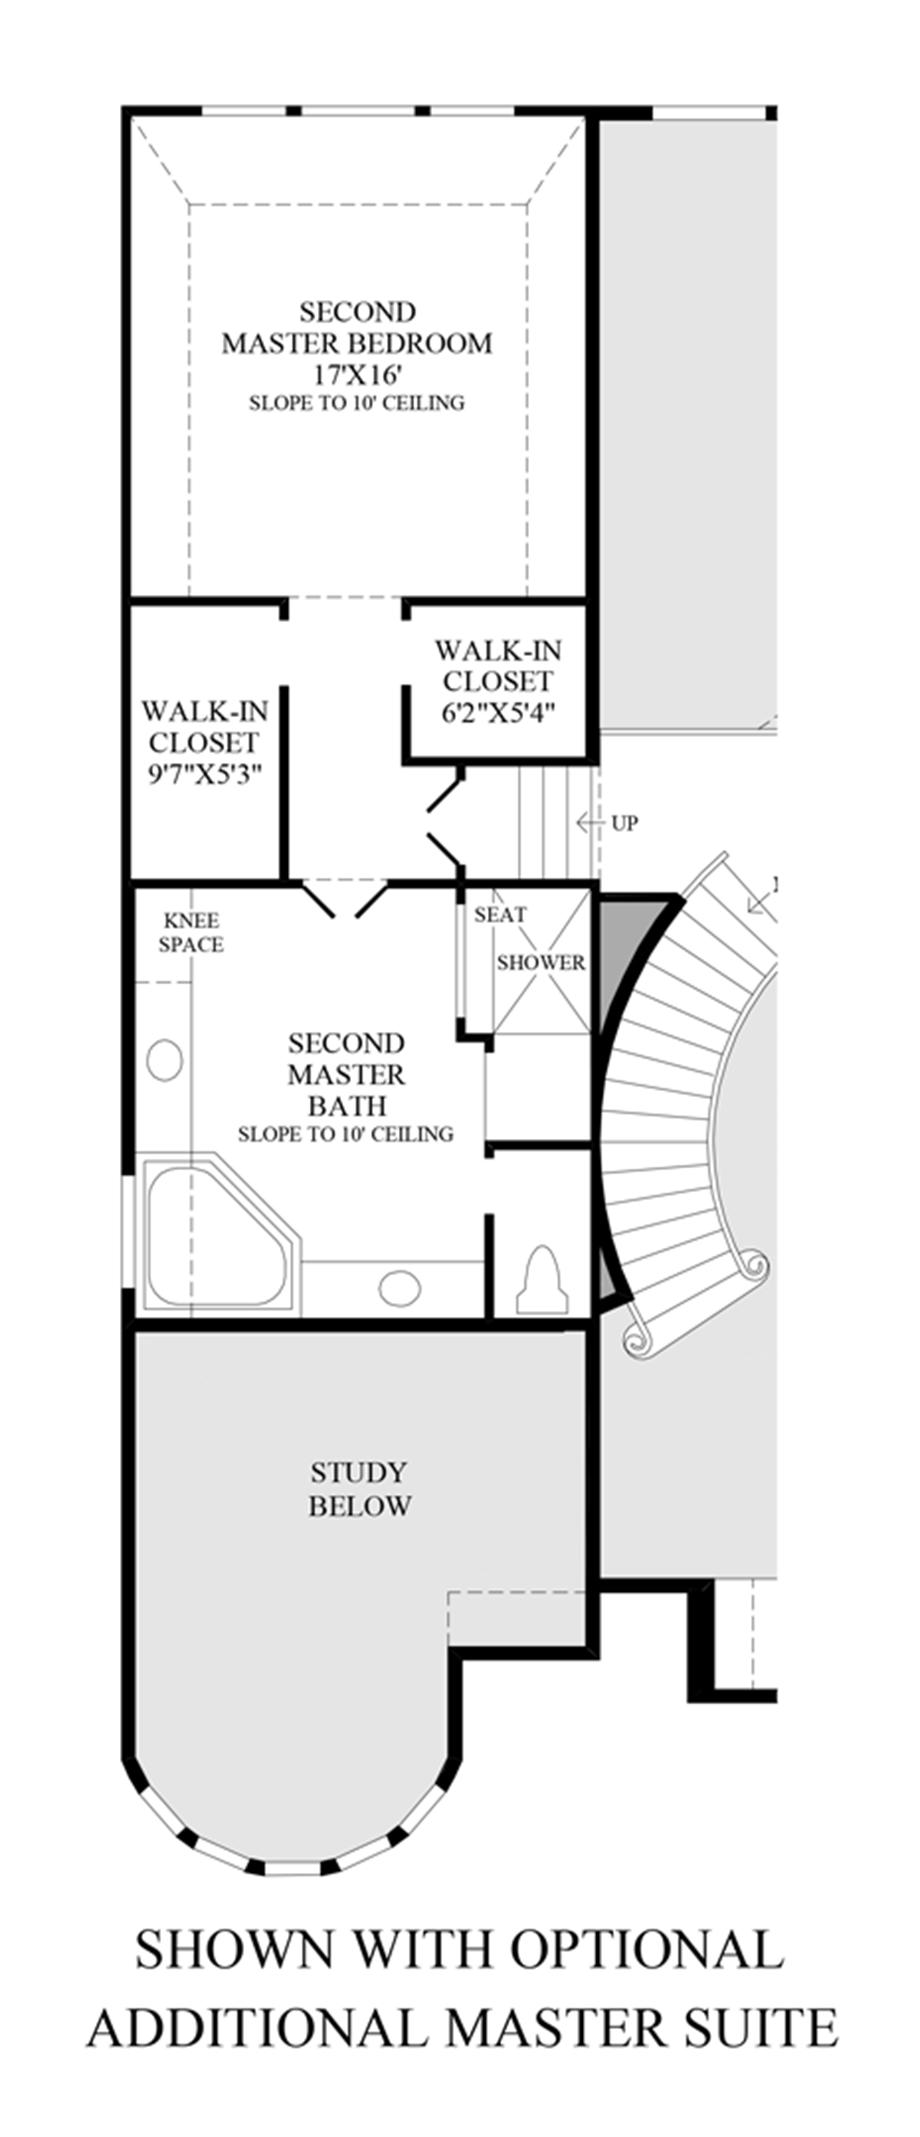 Optional Additional Master Suite Floor Plan